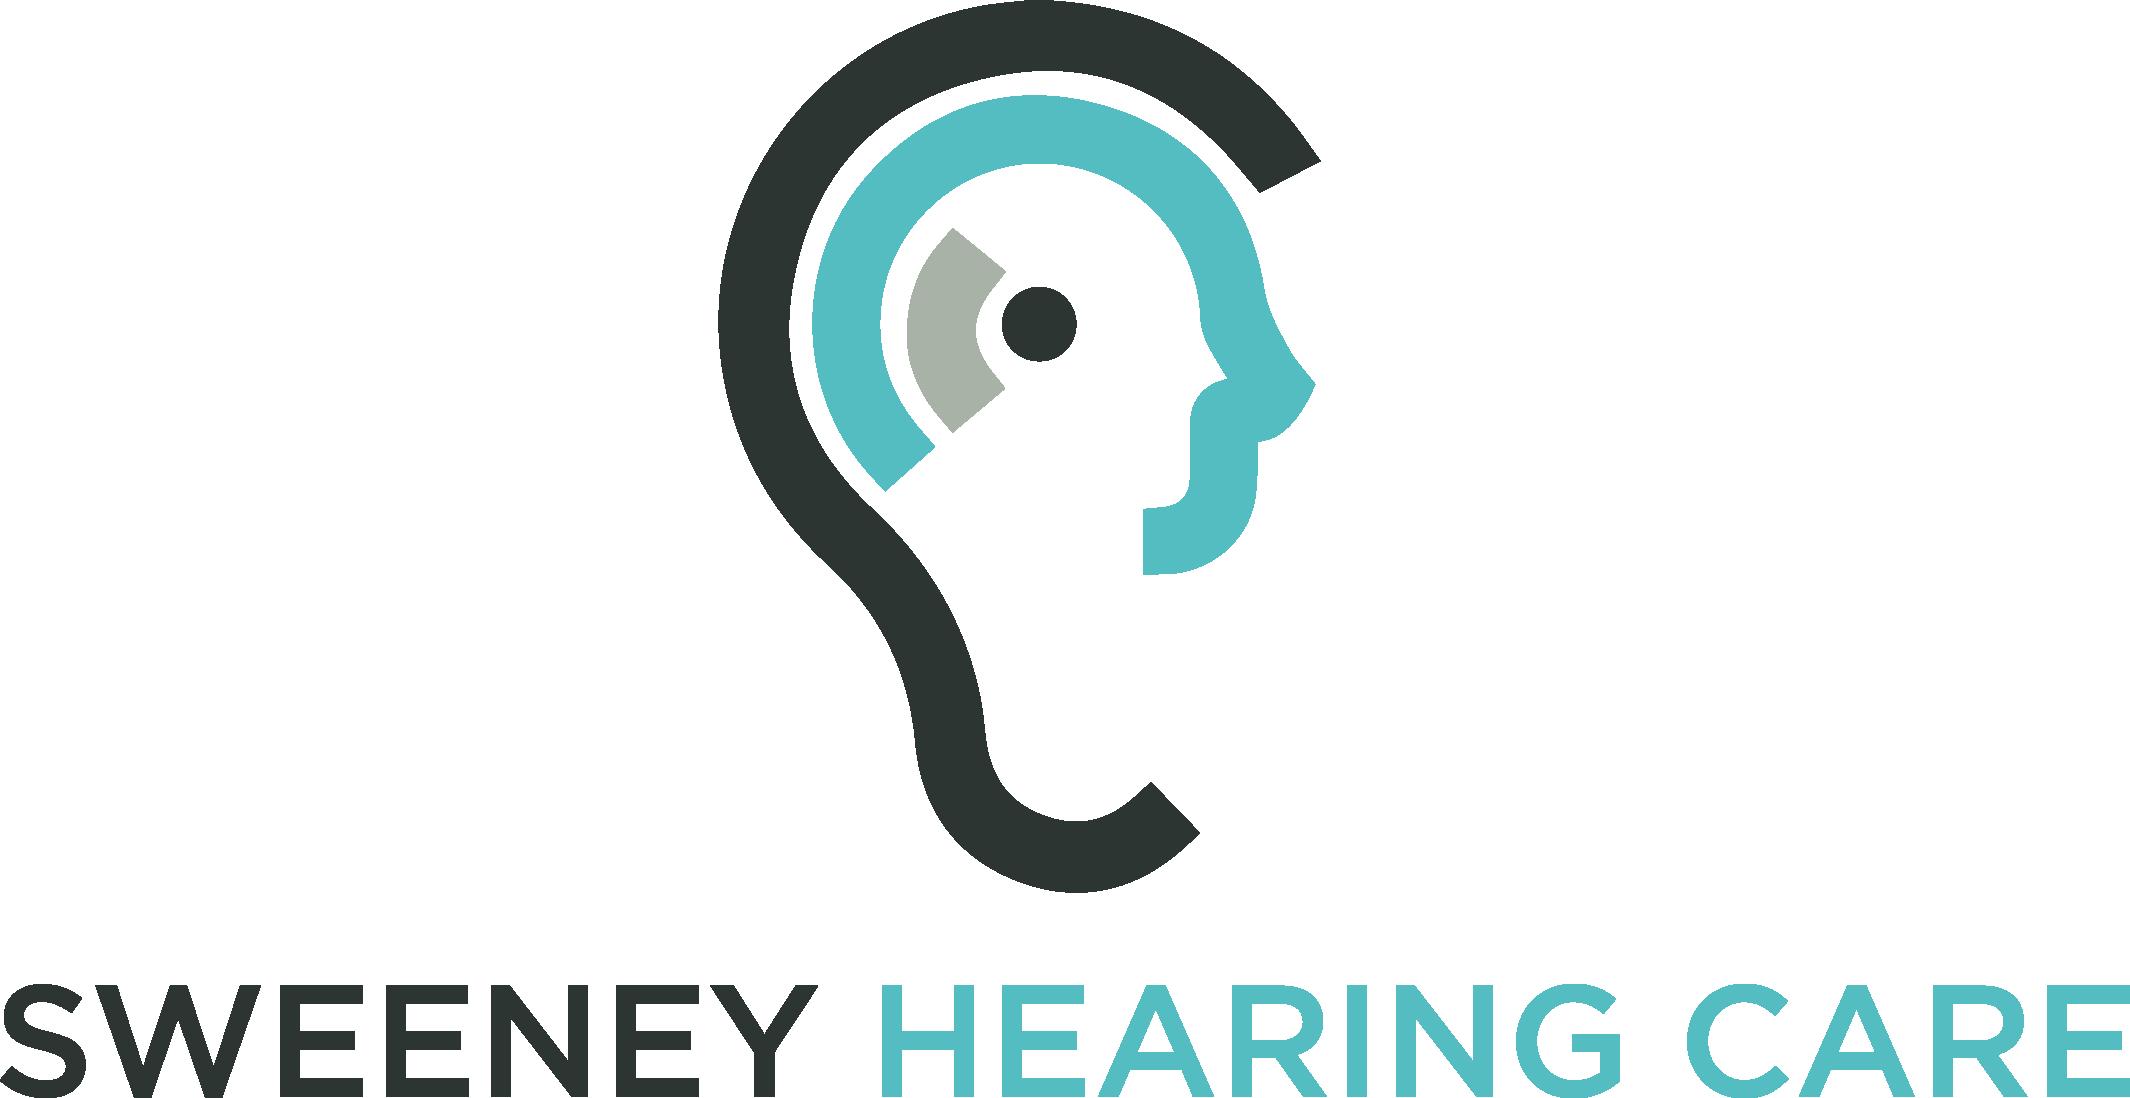 Sweeney Hearing Care